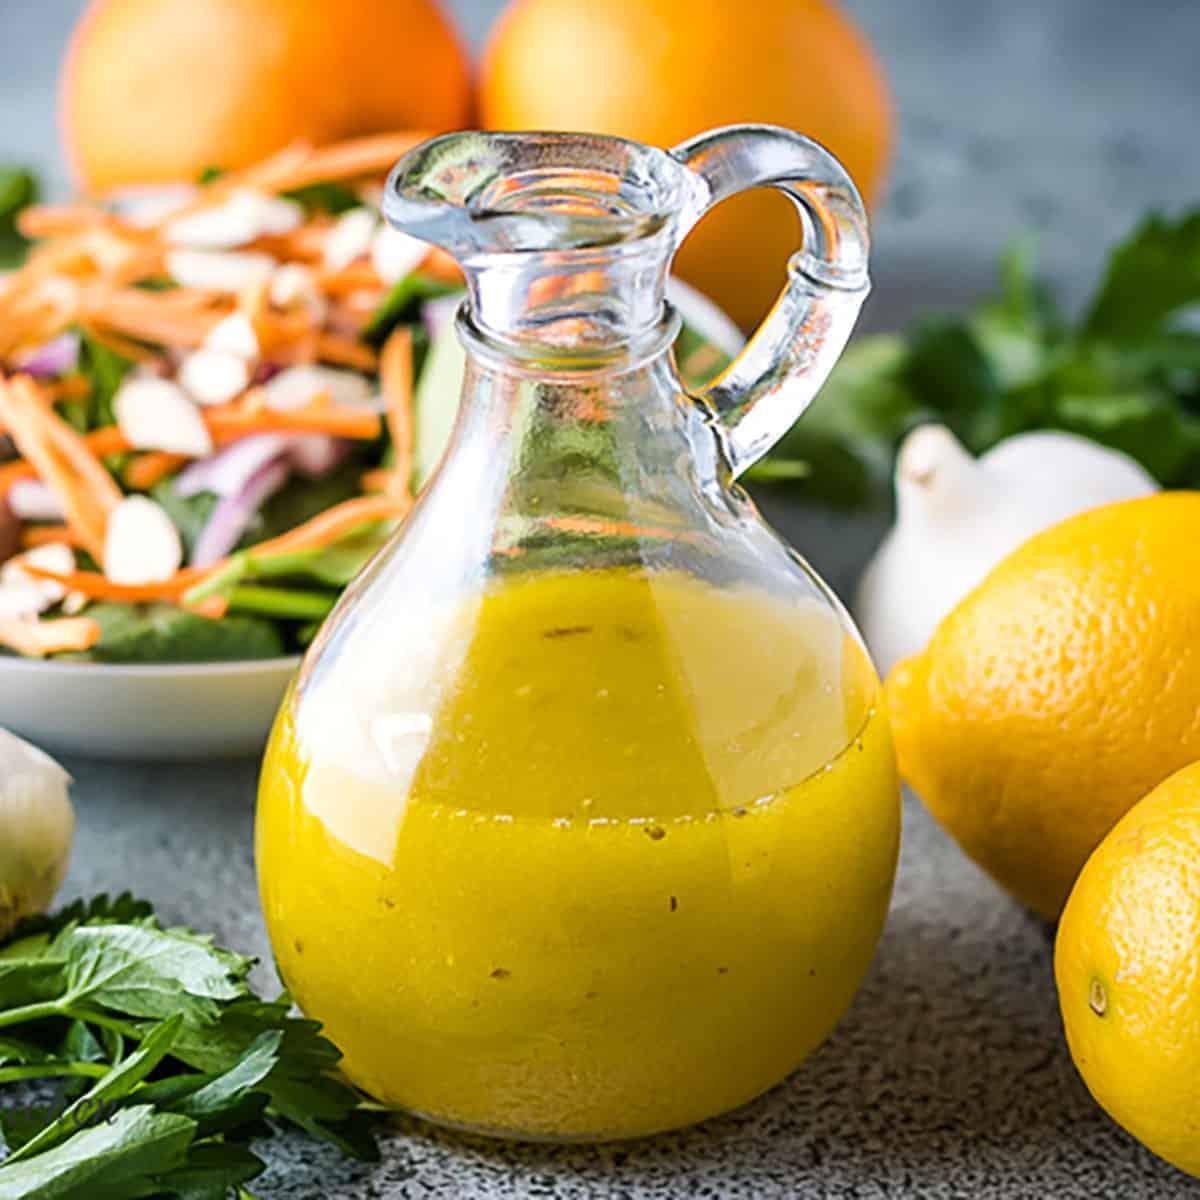 Citrus vinaigrette dressing next to two lemons and garlic.